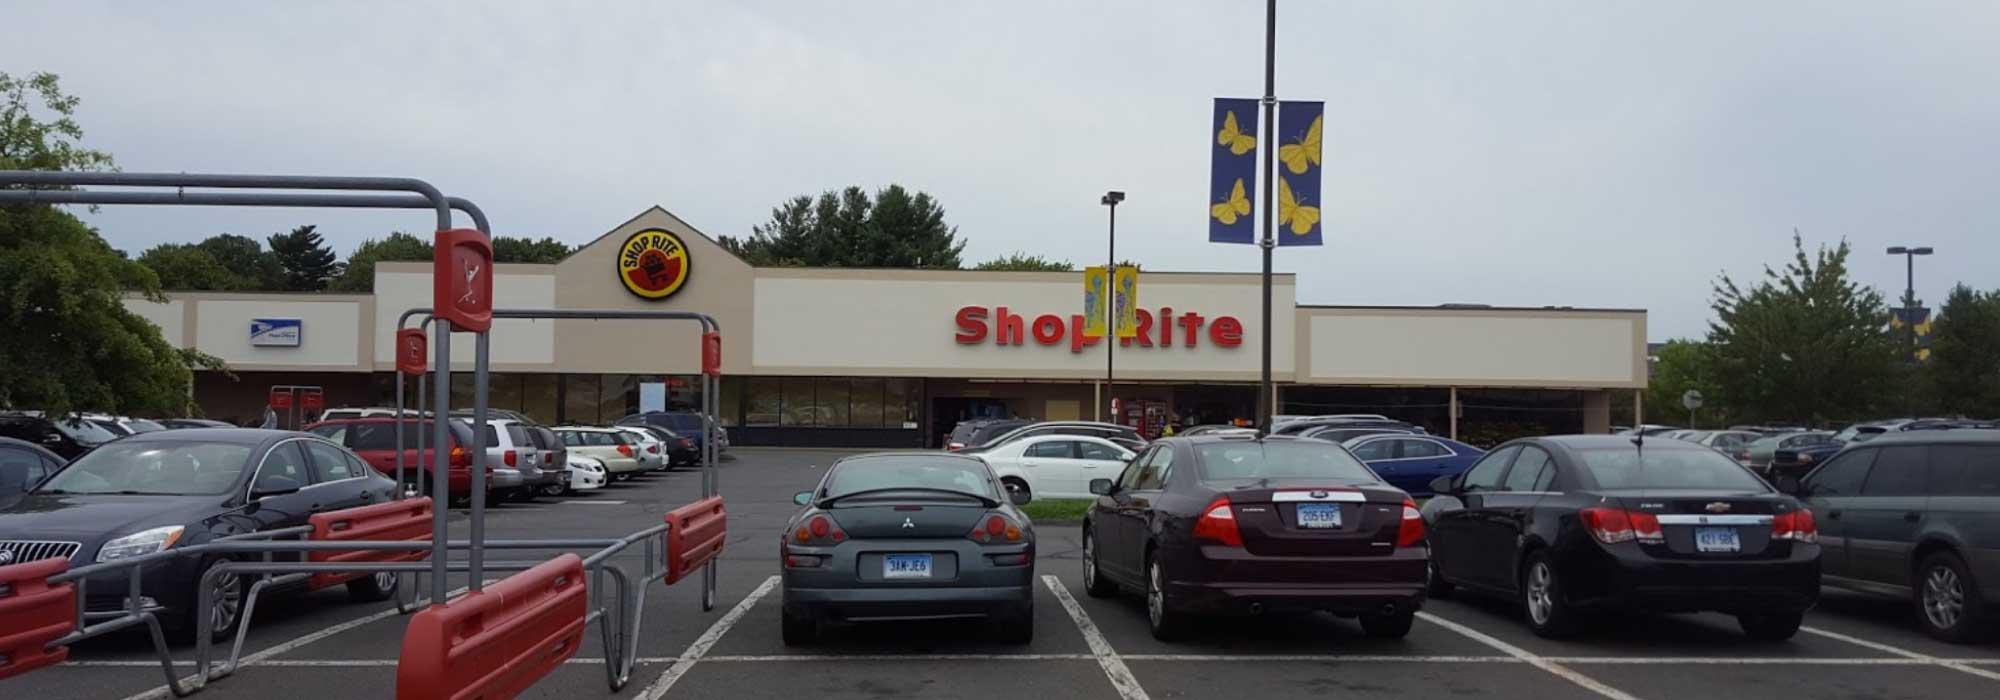 Bristol, Connecticut – Shop Rite Plaza